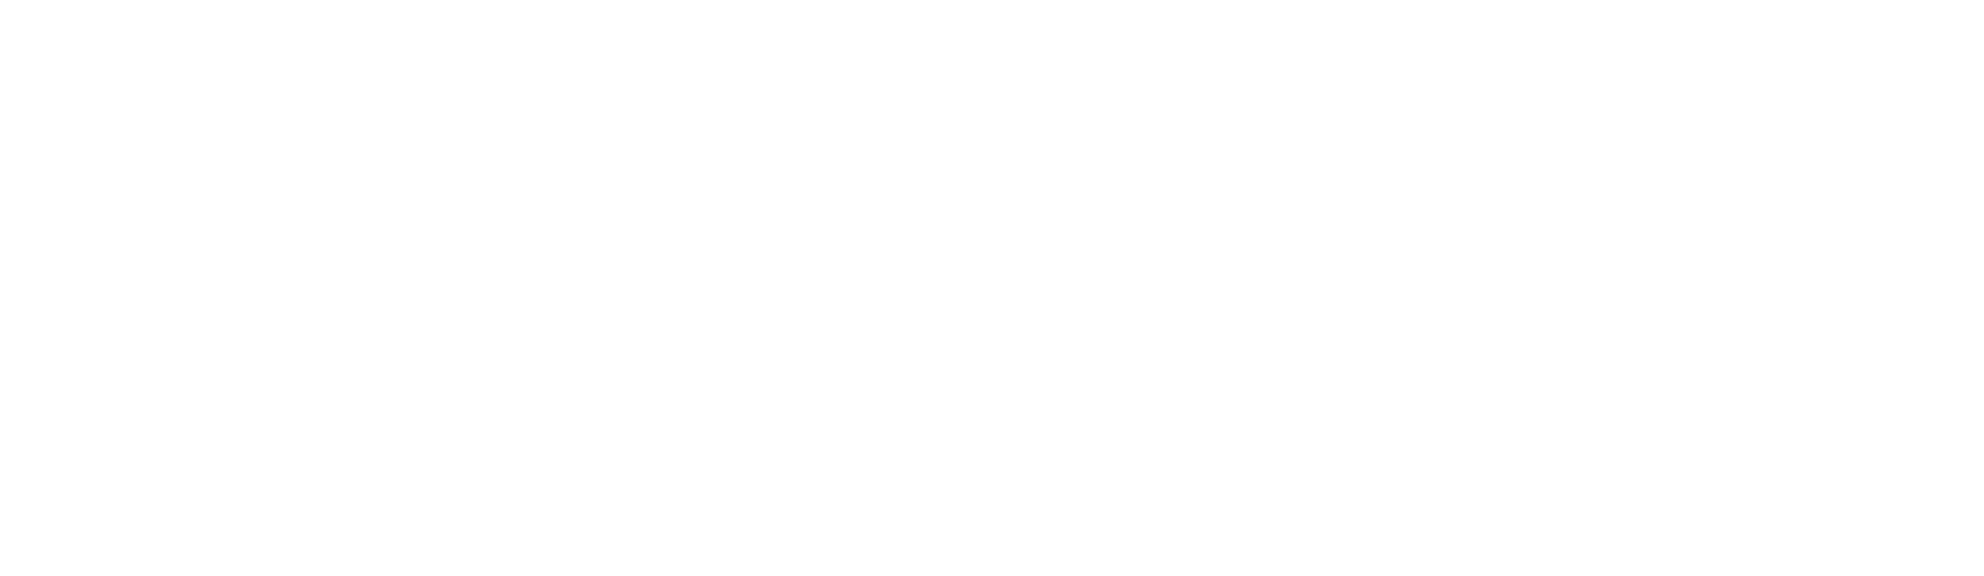 House of Alyssa Smith